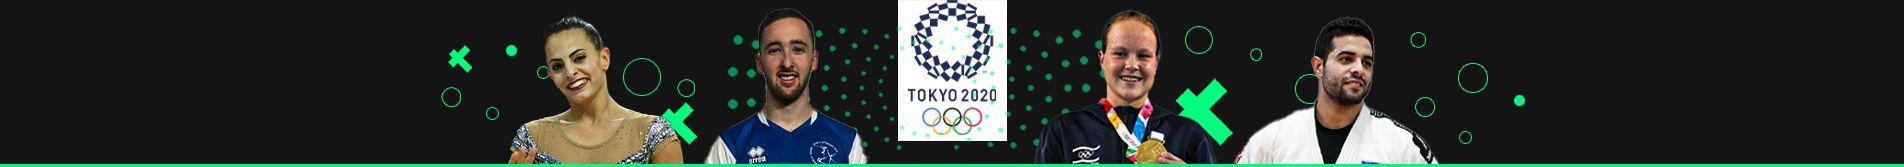 Sport1 Banner